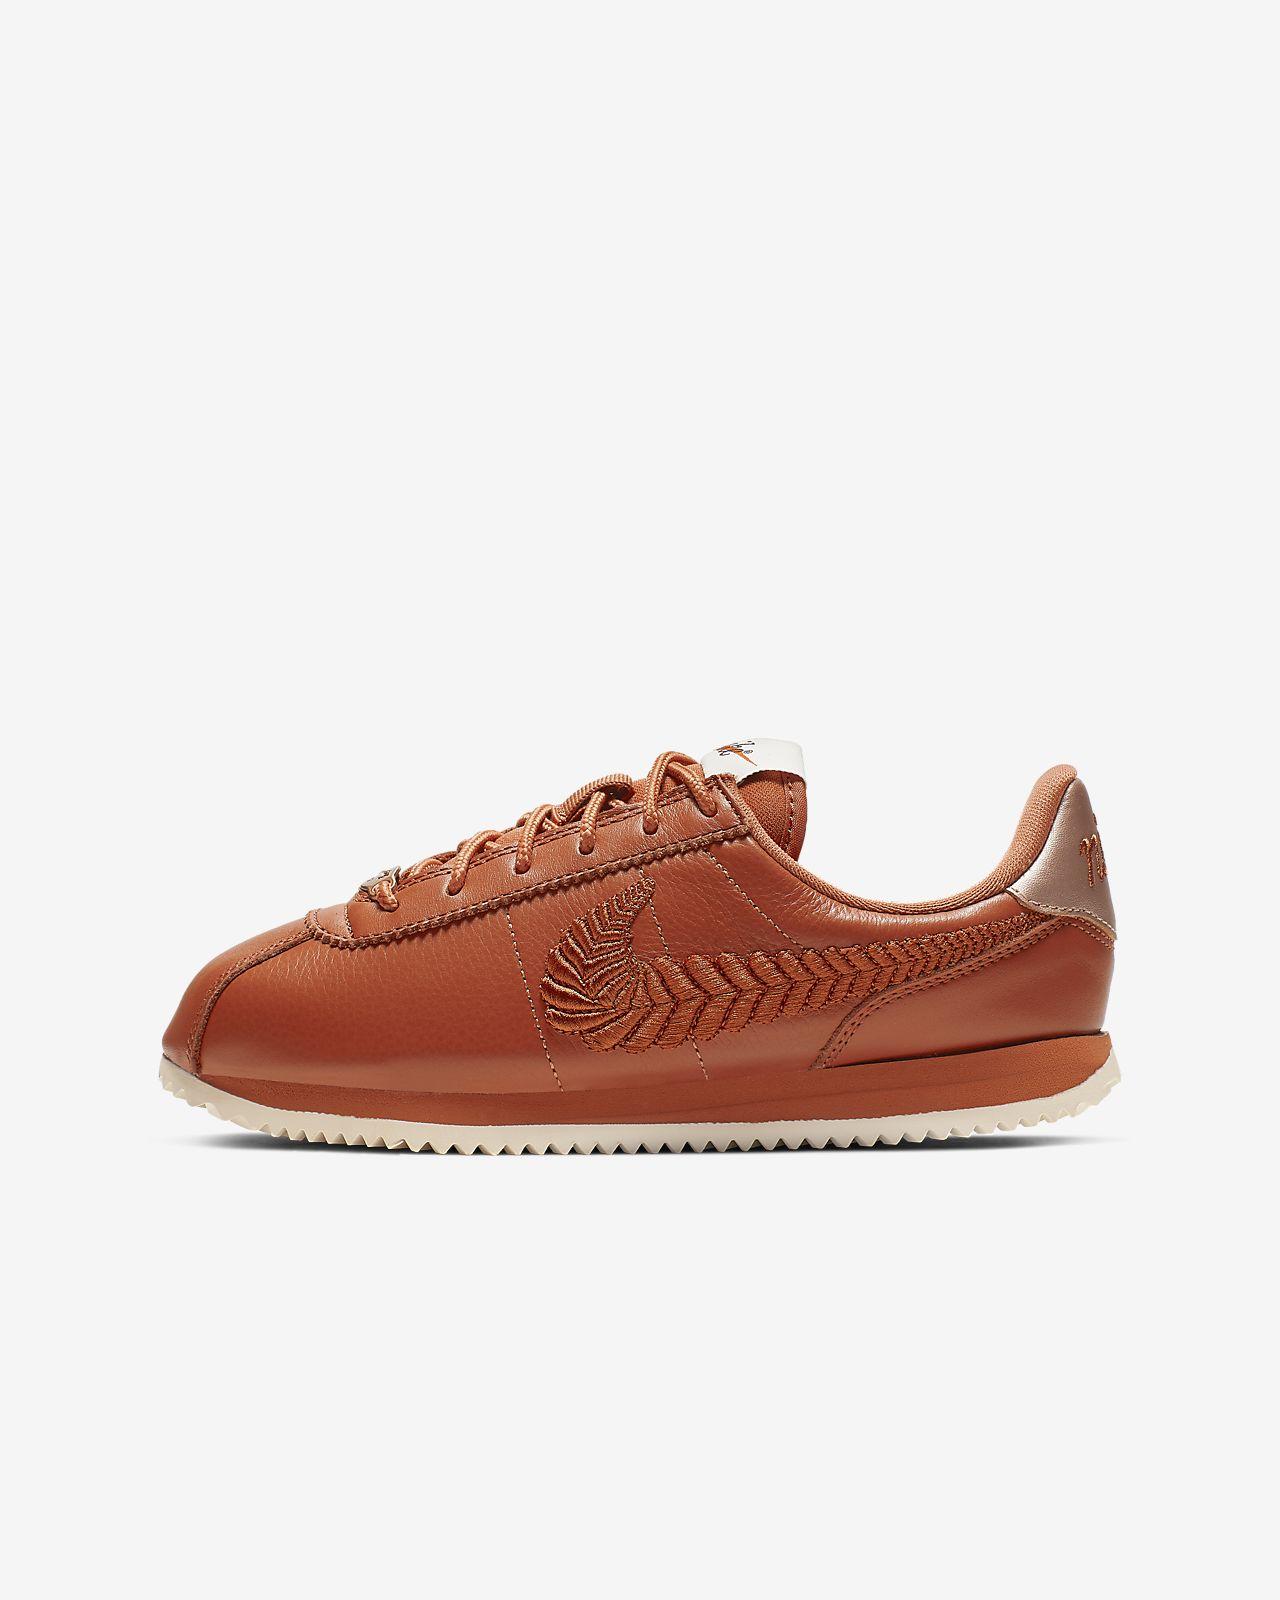 separation shoes 617a5 2f52e ... Sapatilhas Nike Cortez Basic Premium Embroidered Júnior